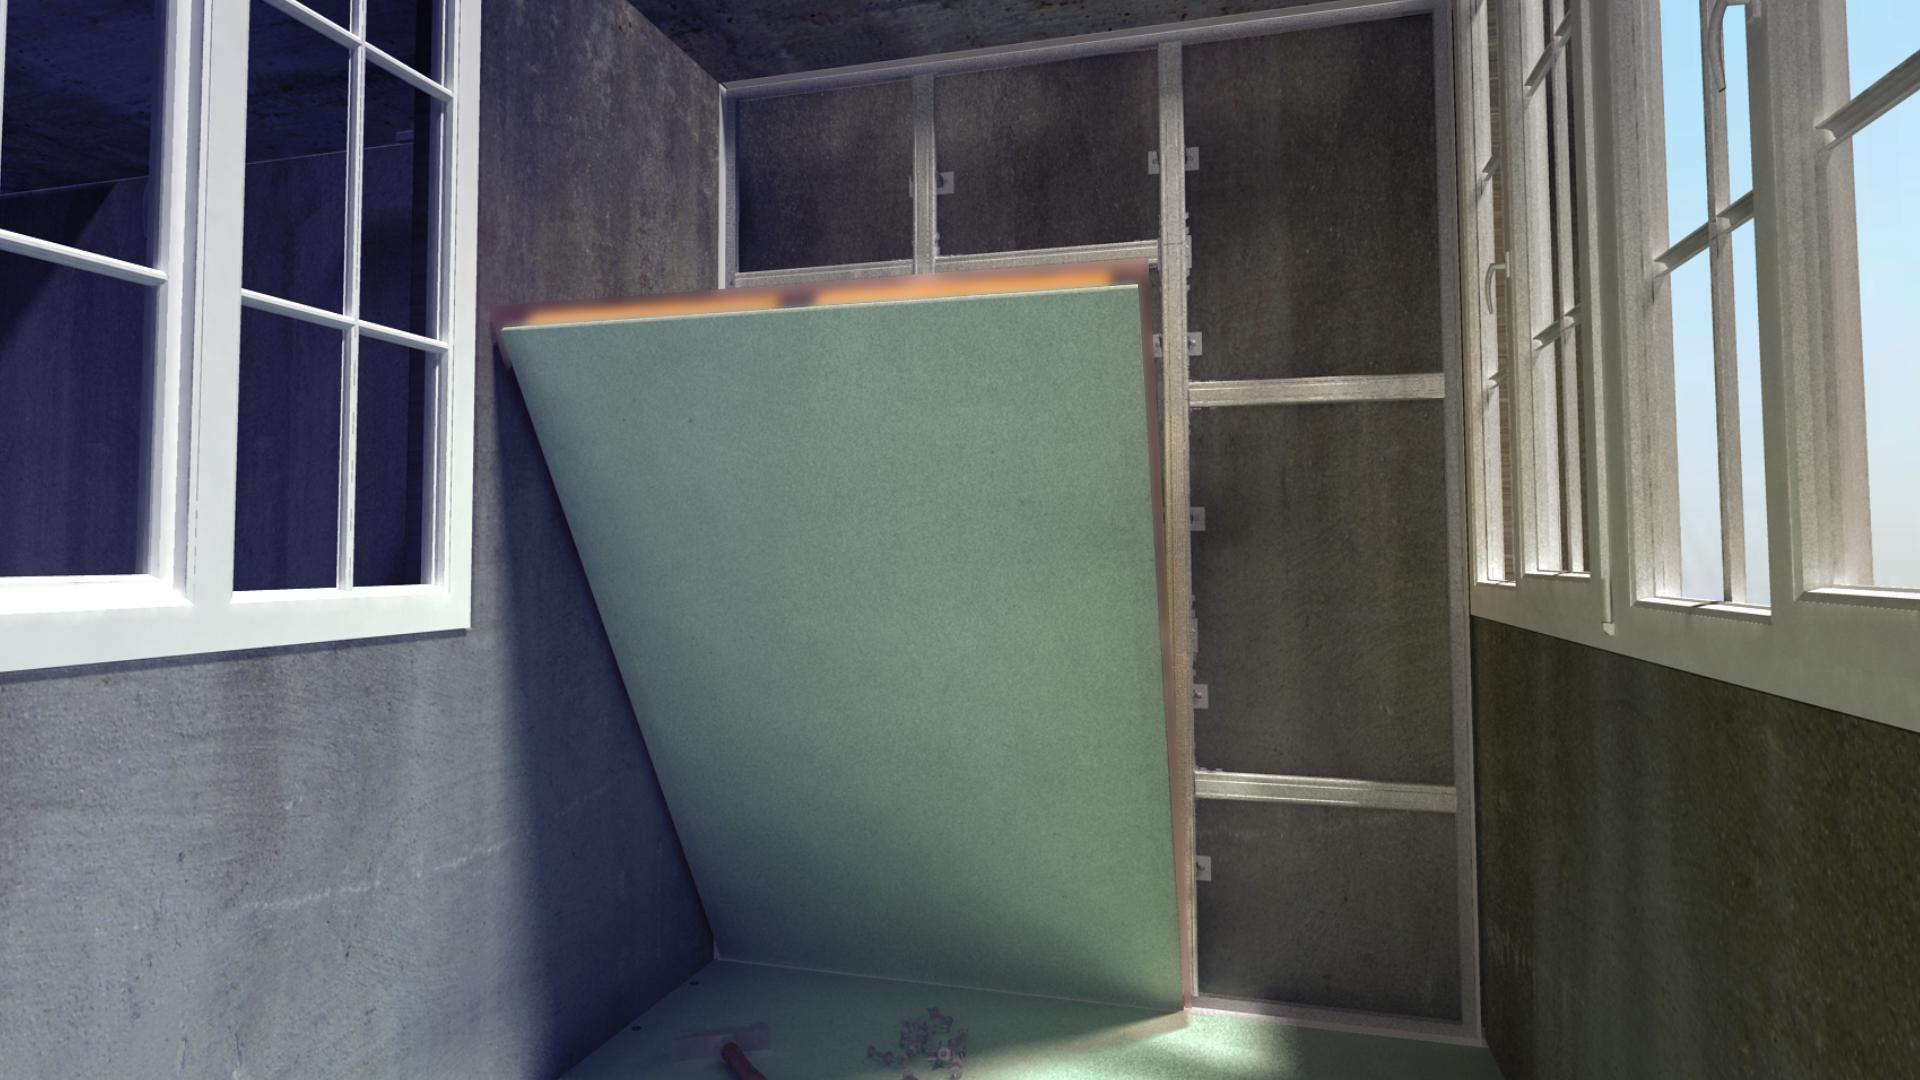 Панель теплоизоляционная Gyproc Теплый балкон 1200х900х110 мм